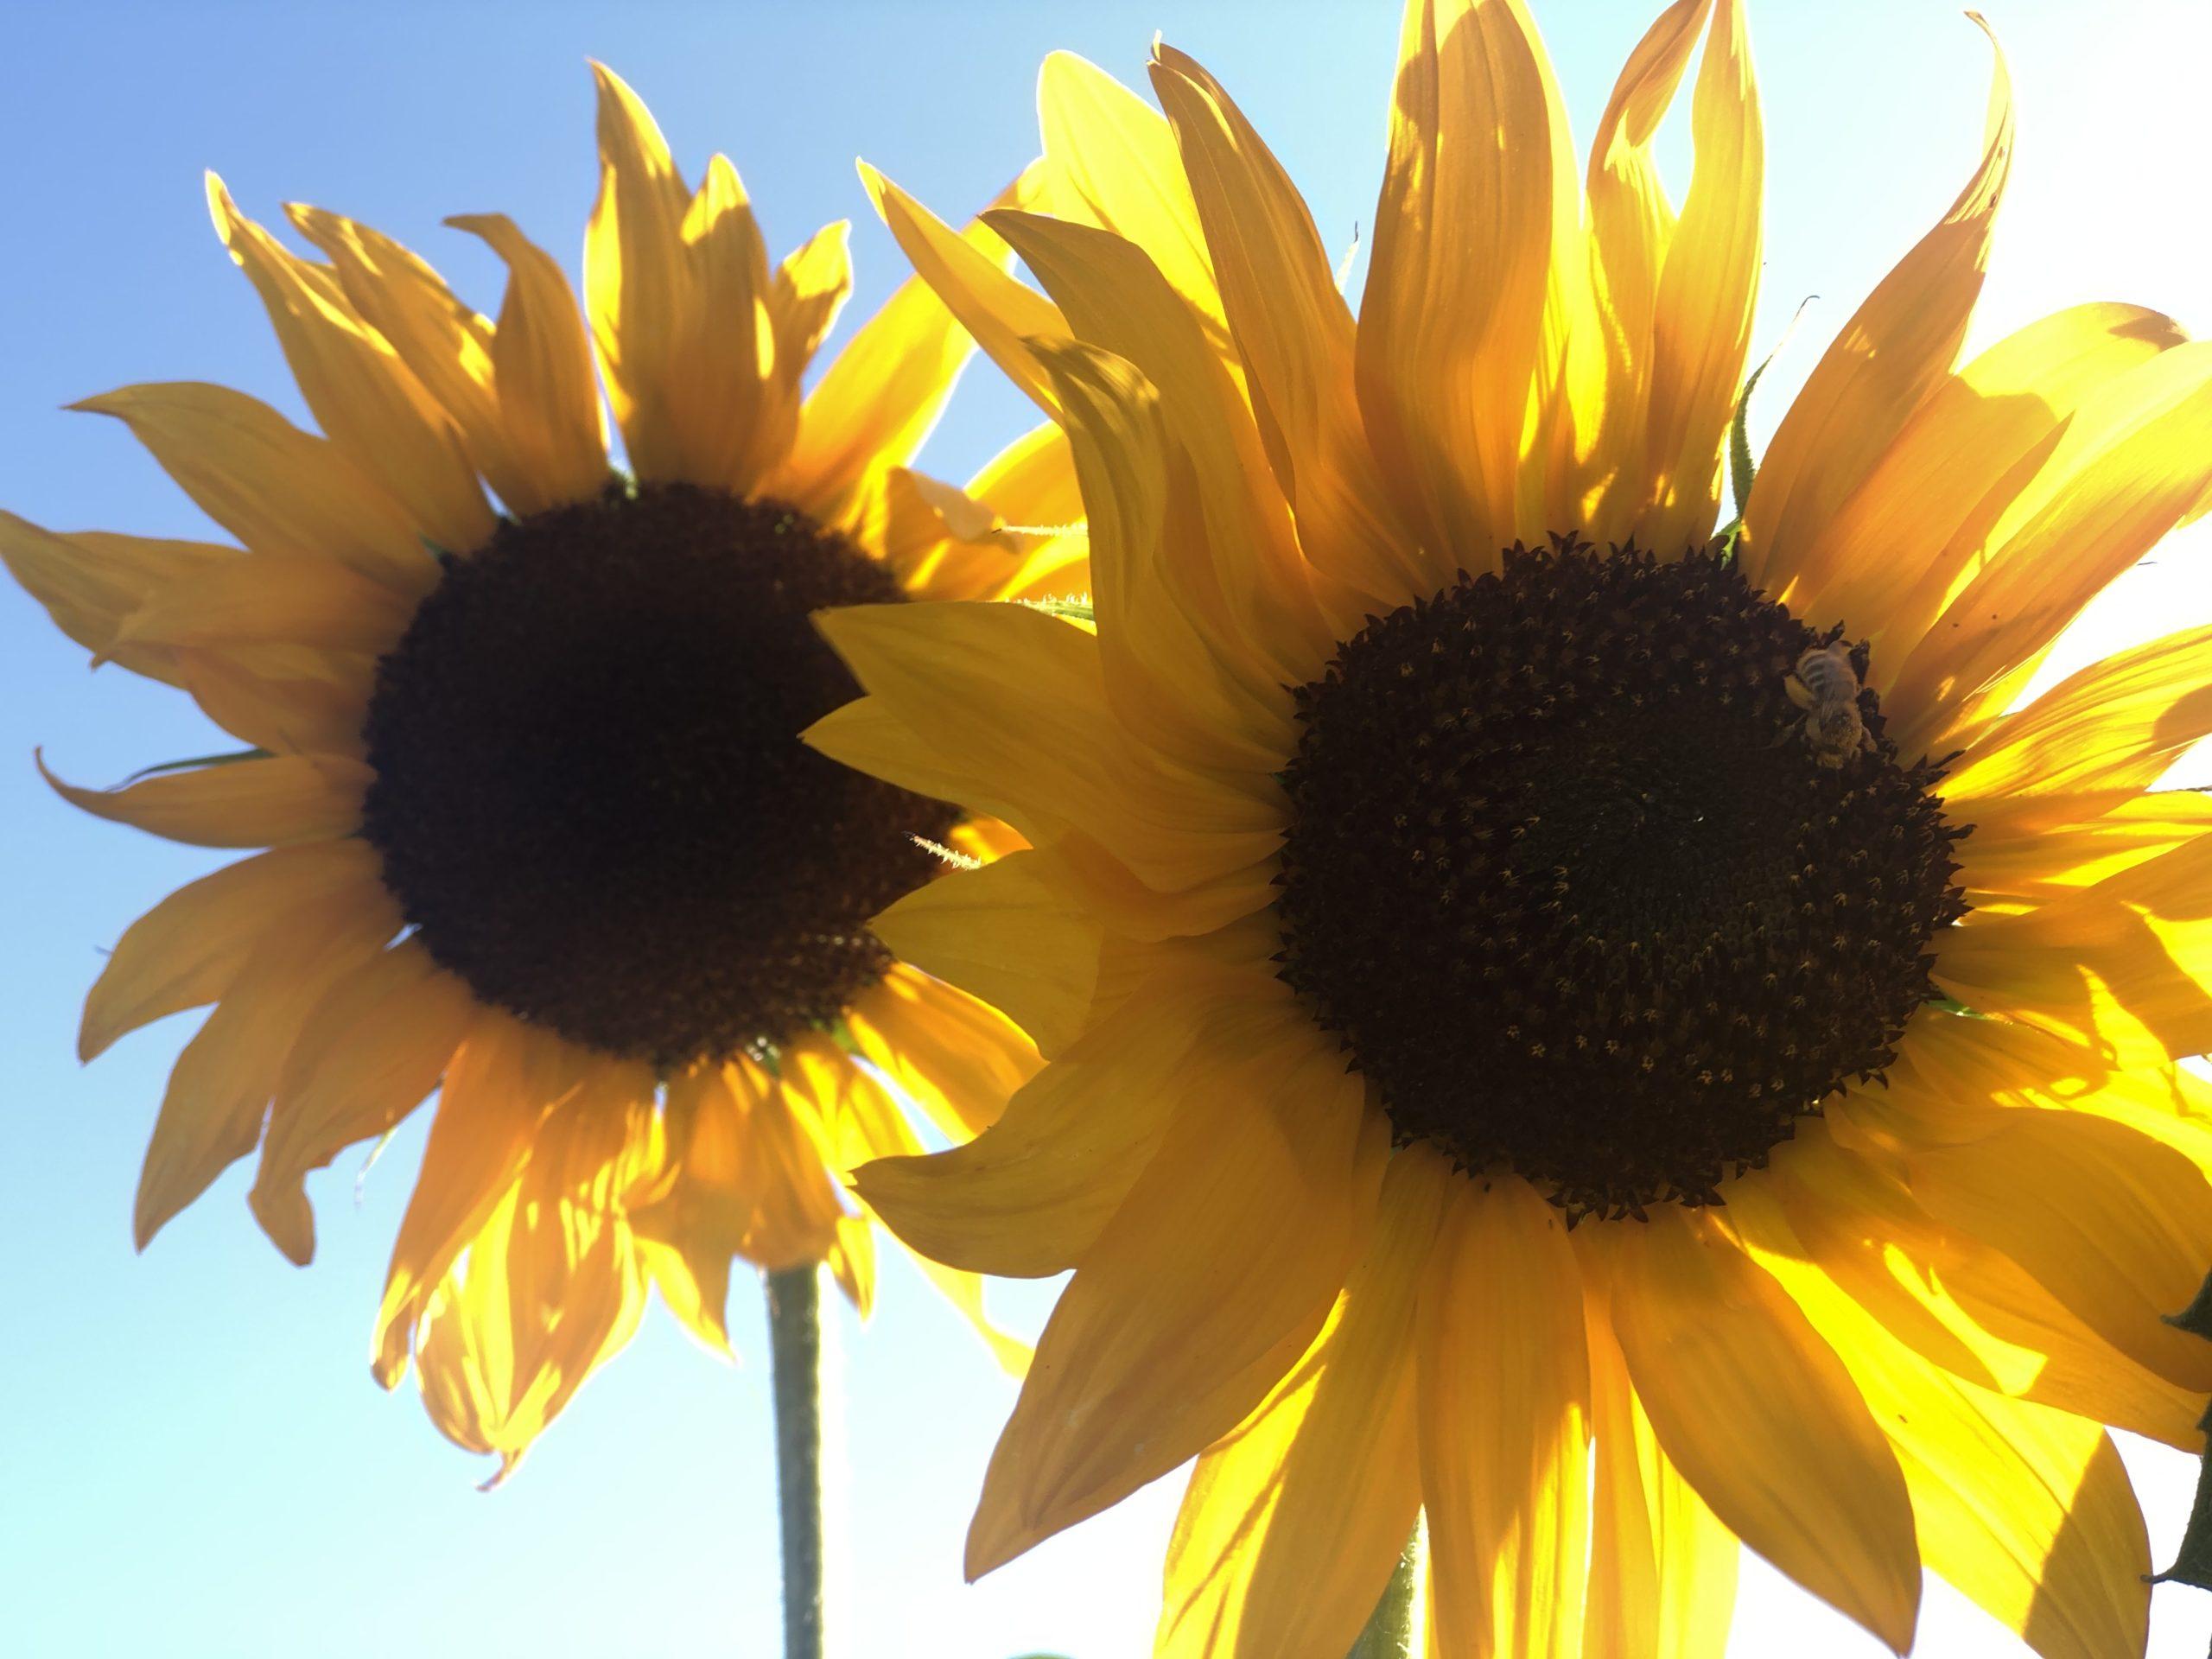 SUnflowers in the sun